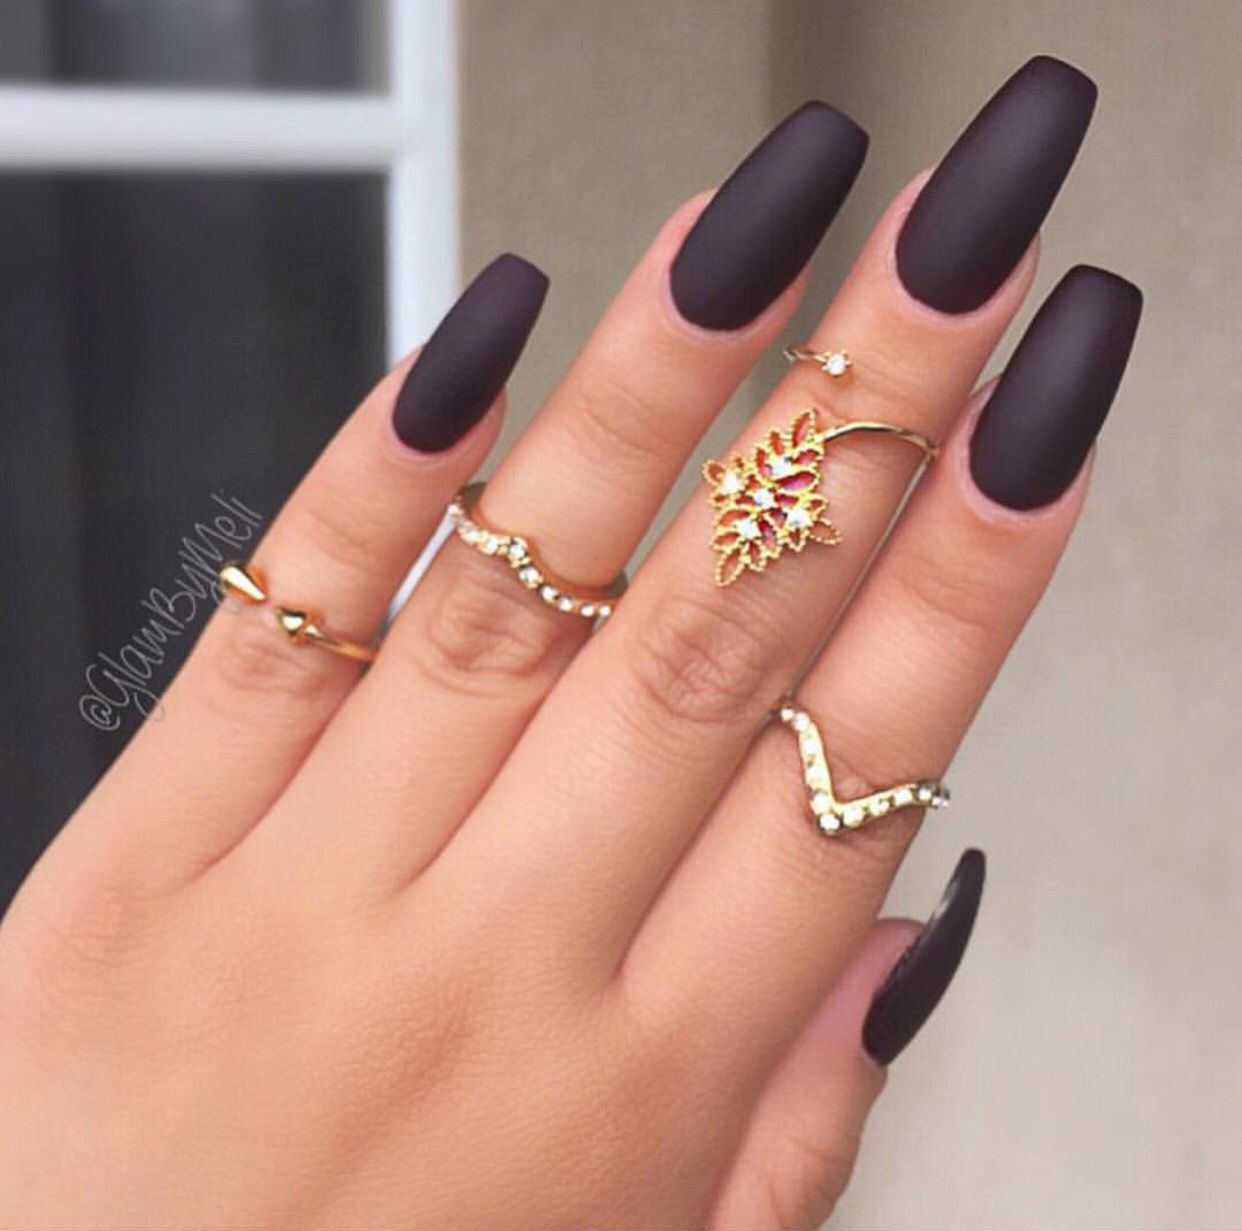 Beautiful black matted nails | Nails | Pinterest